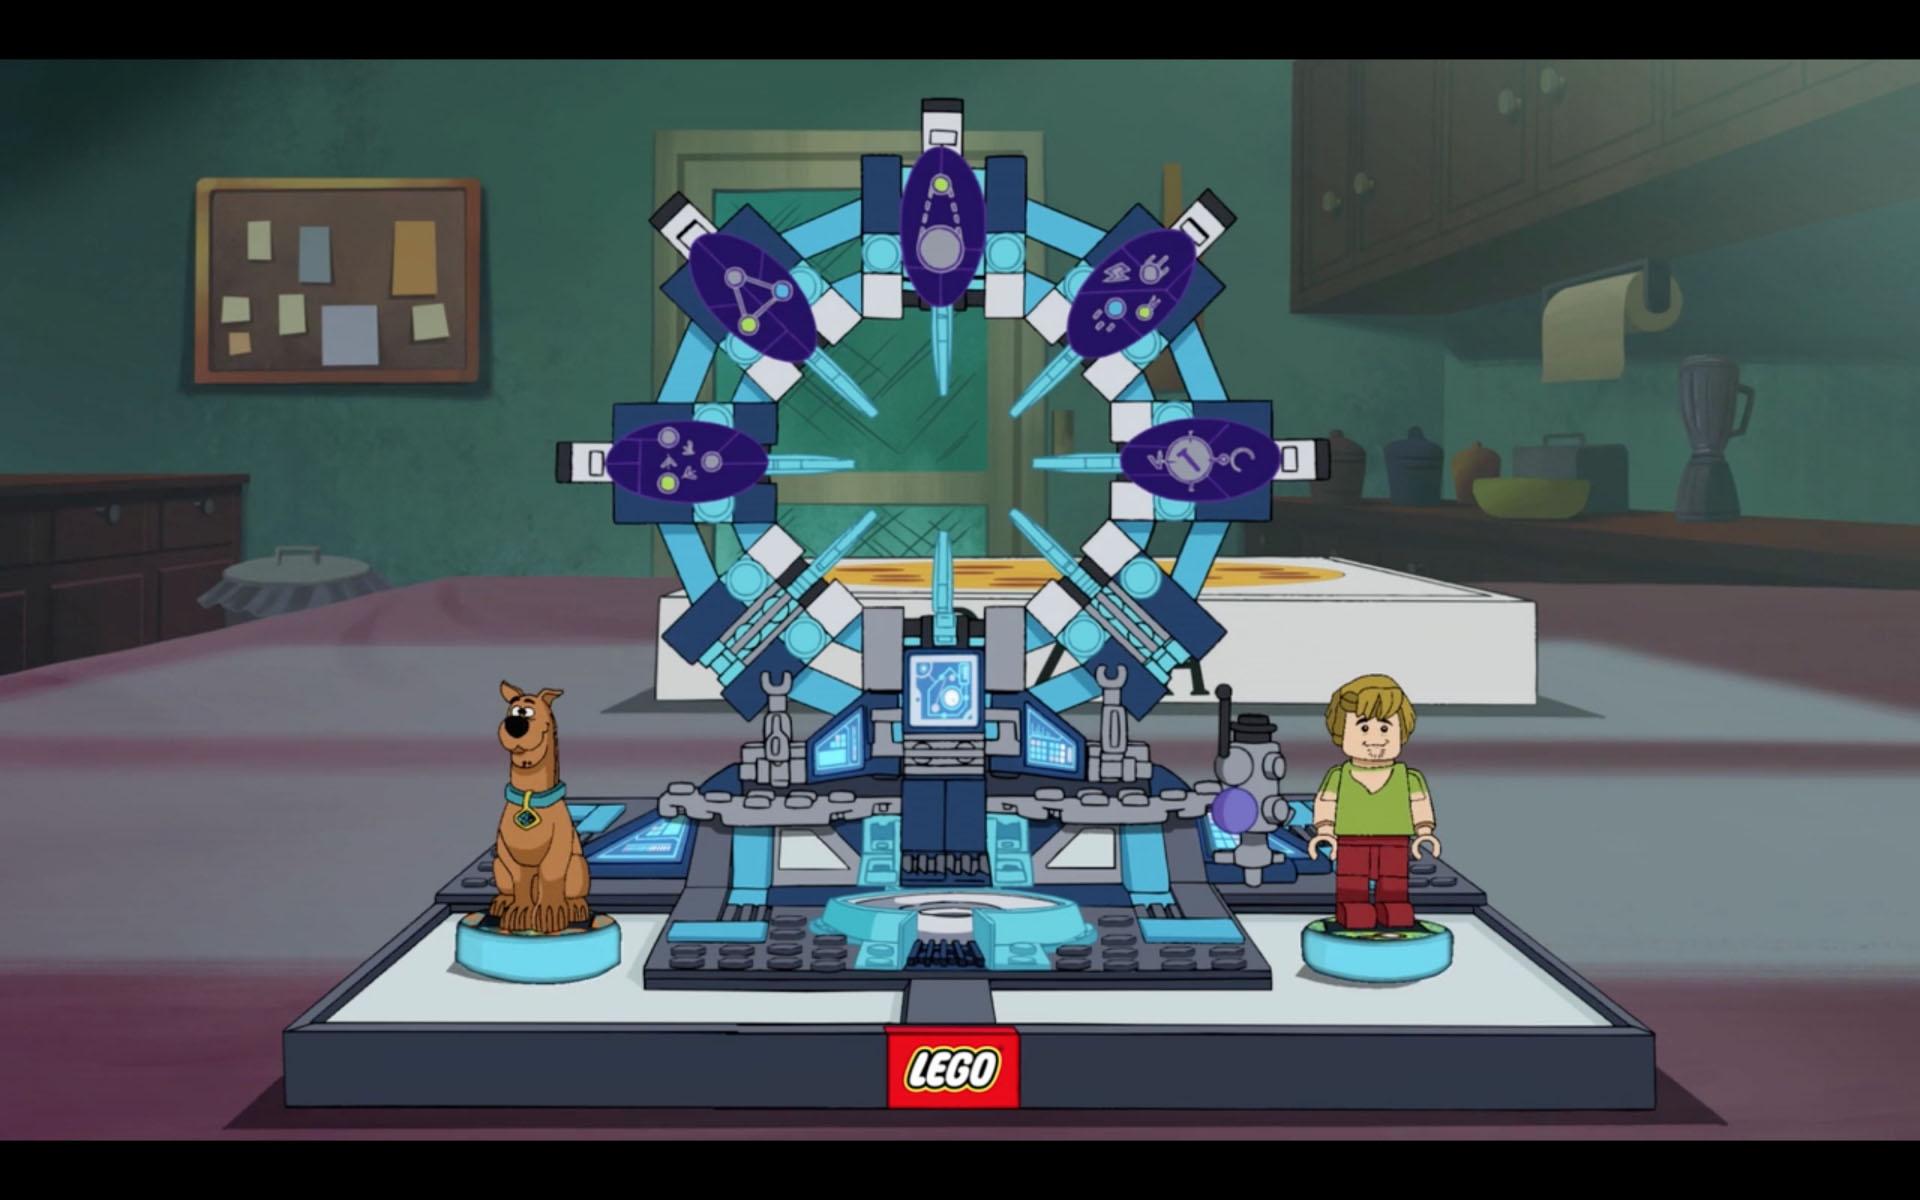 LEGO-dimensions-scooby-doo-gamesoul